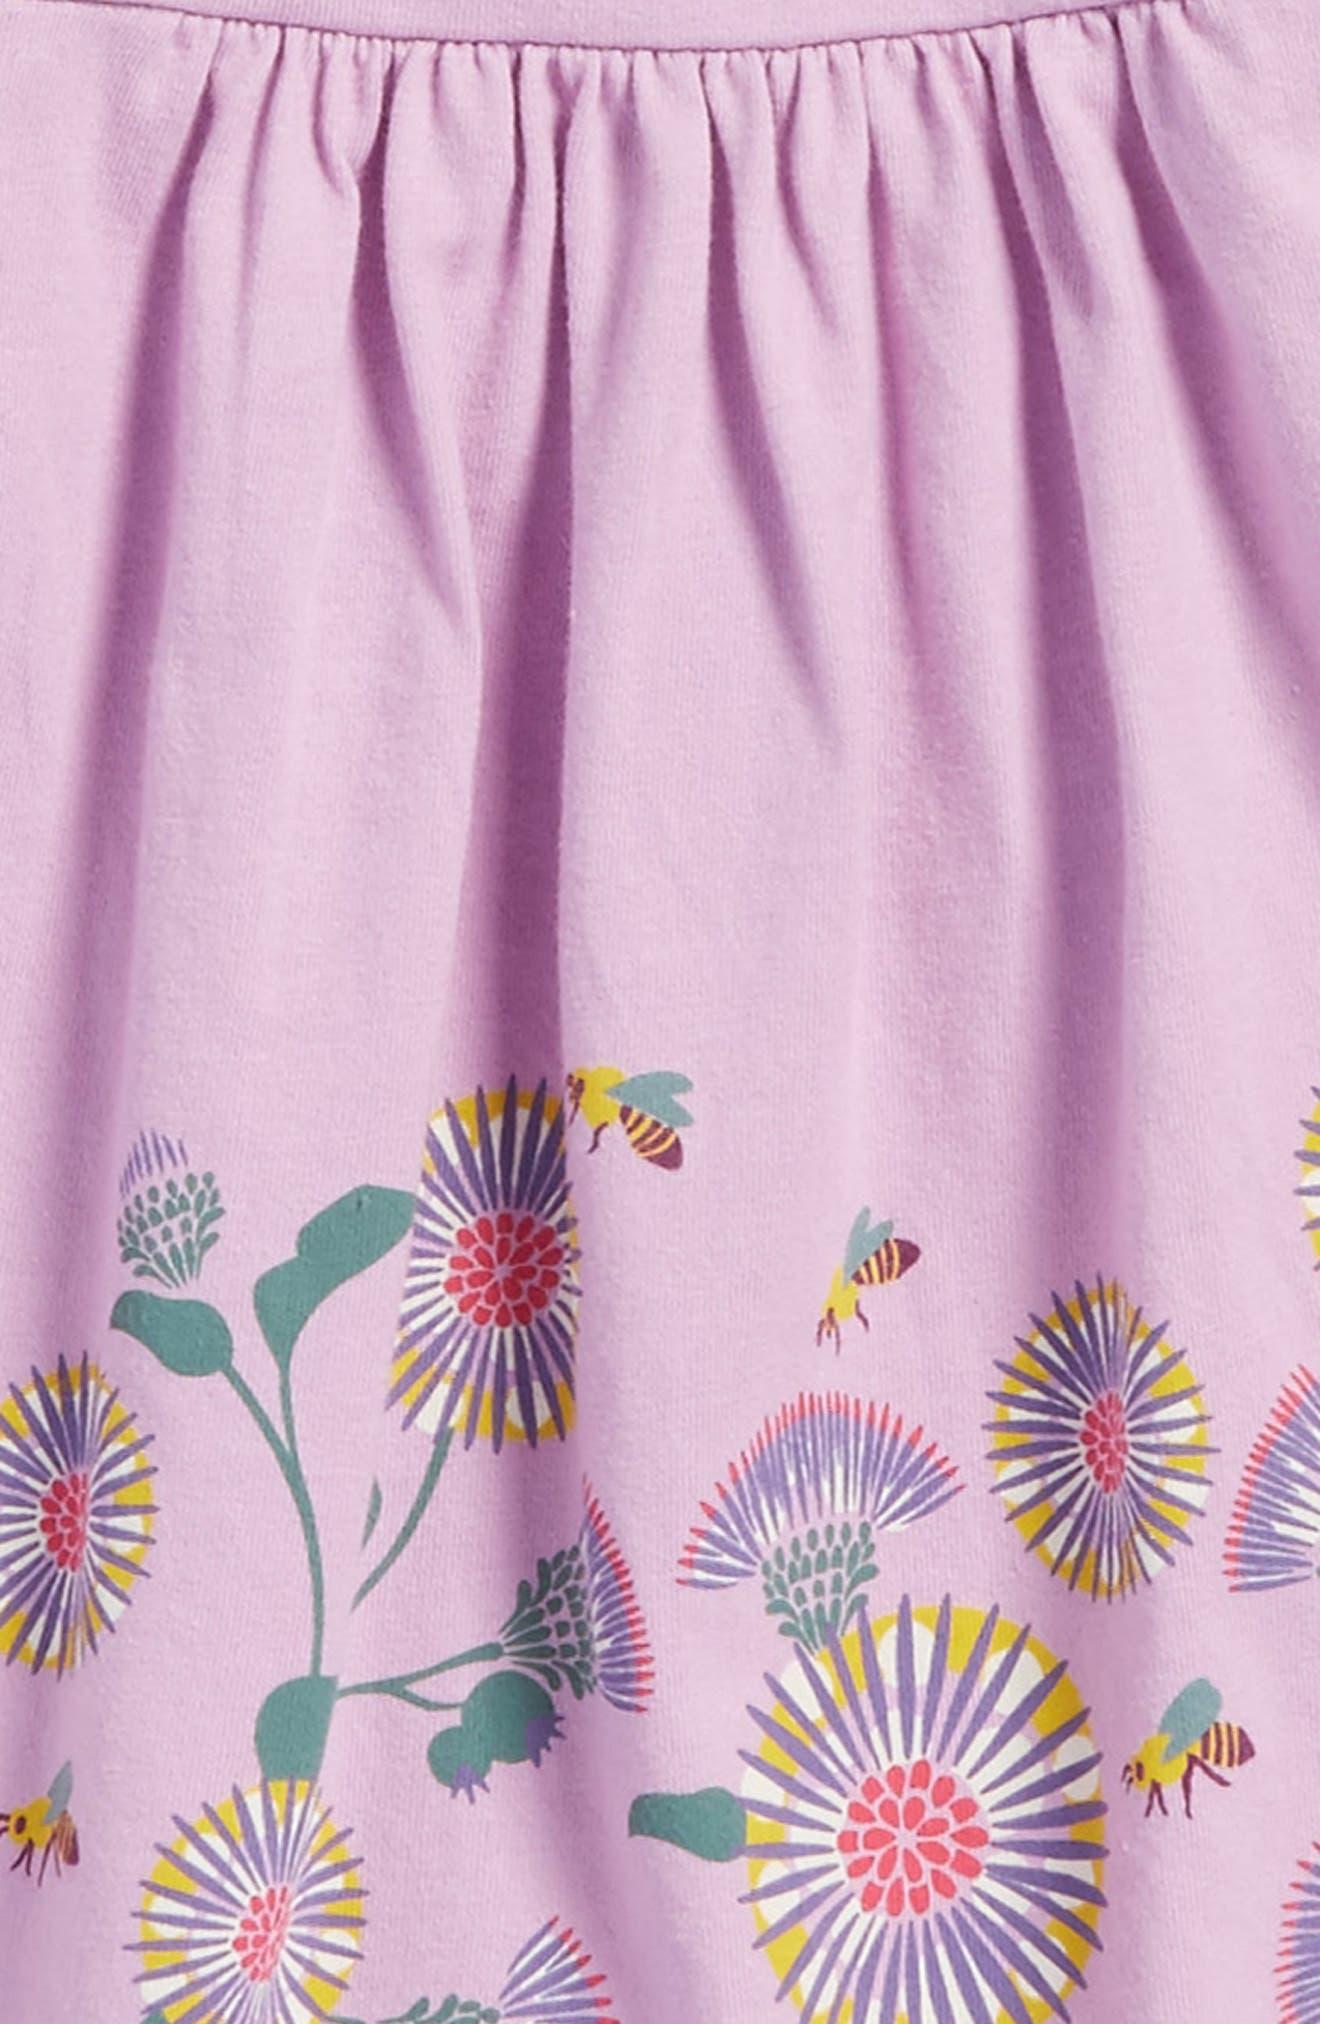 Thistle Print Dress,                             Alternate thumbnail 3, color,                             535